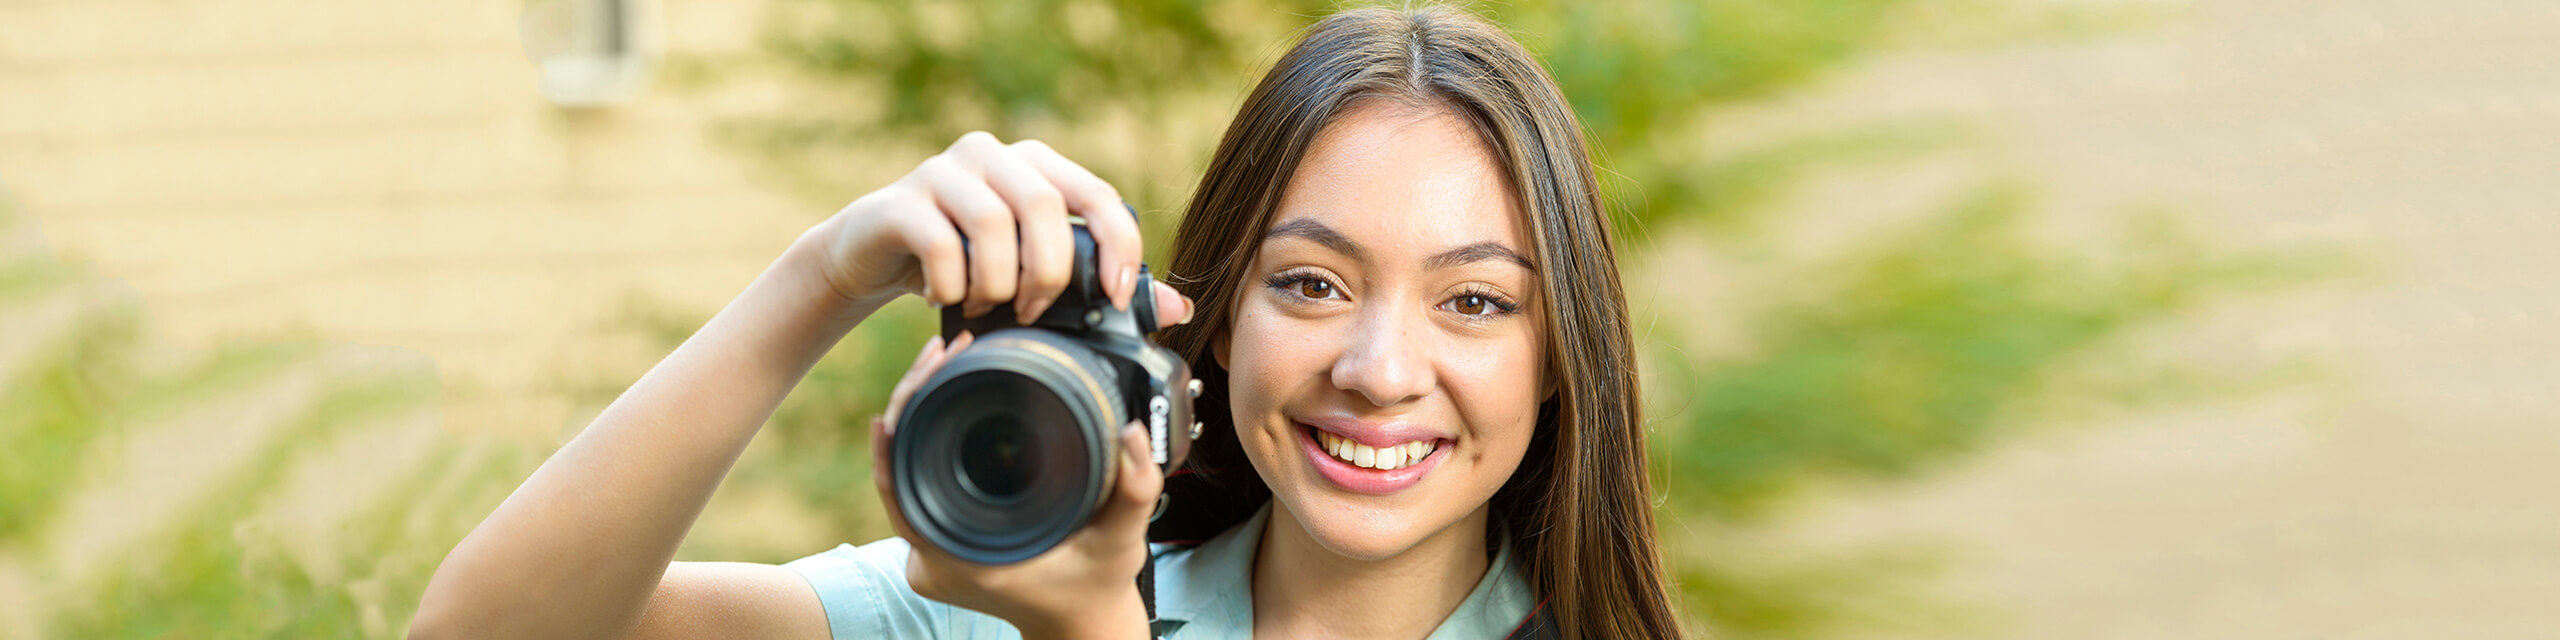 Photography student - Brighton Secondary School